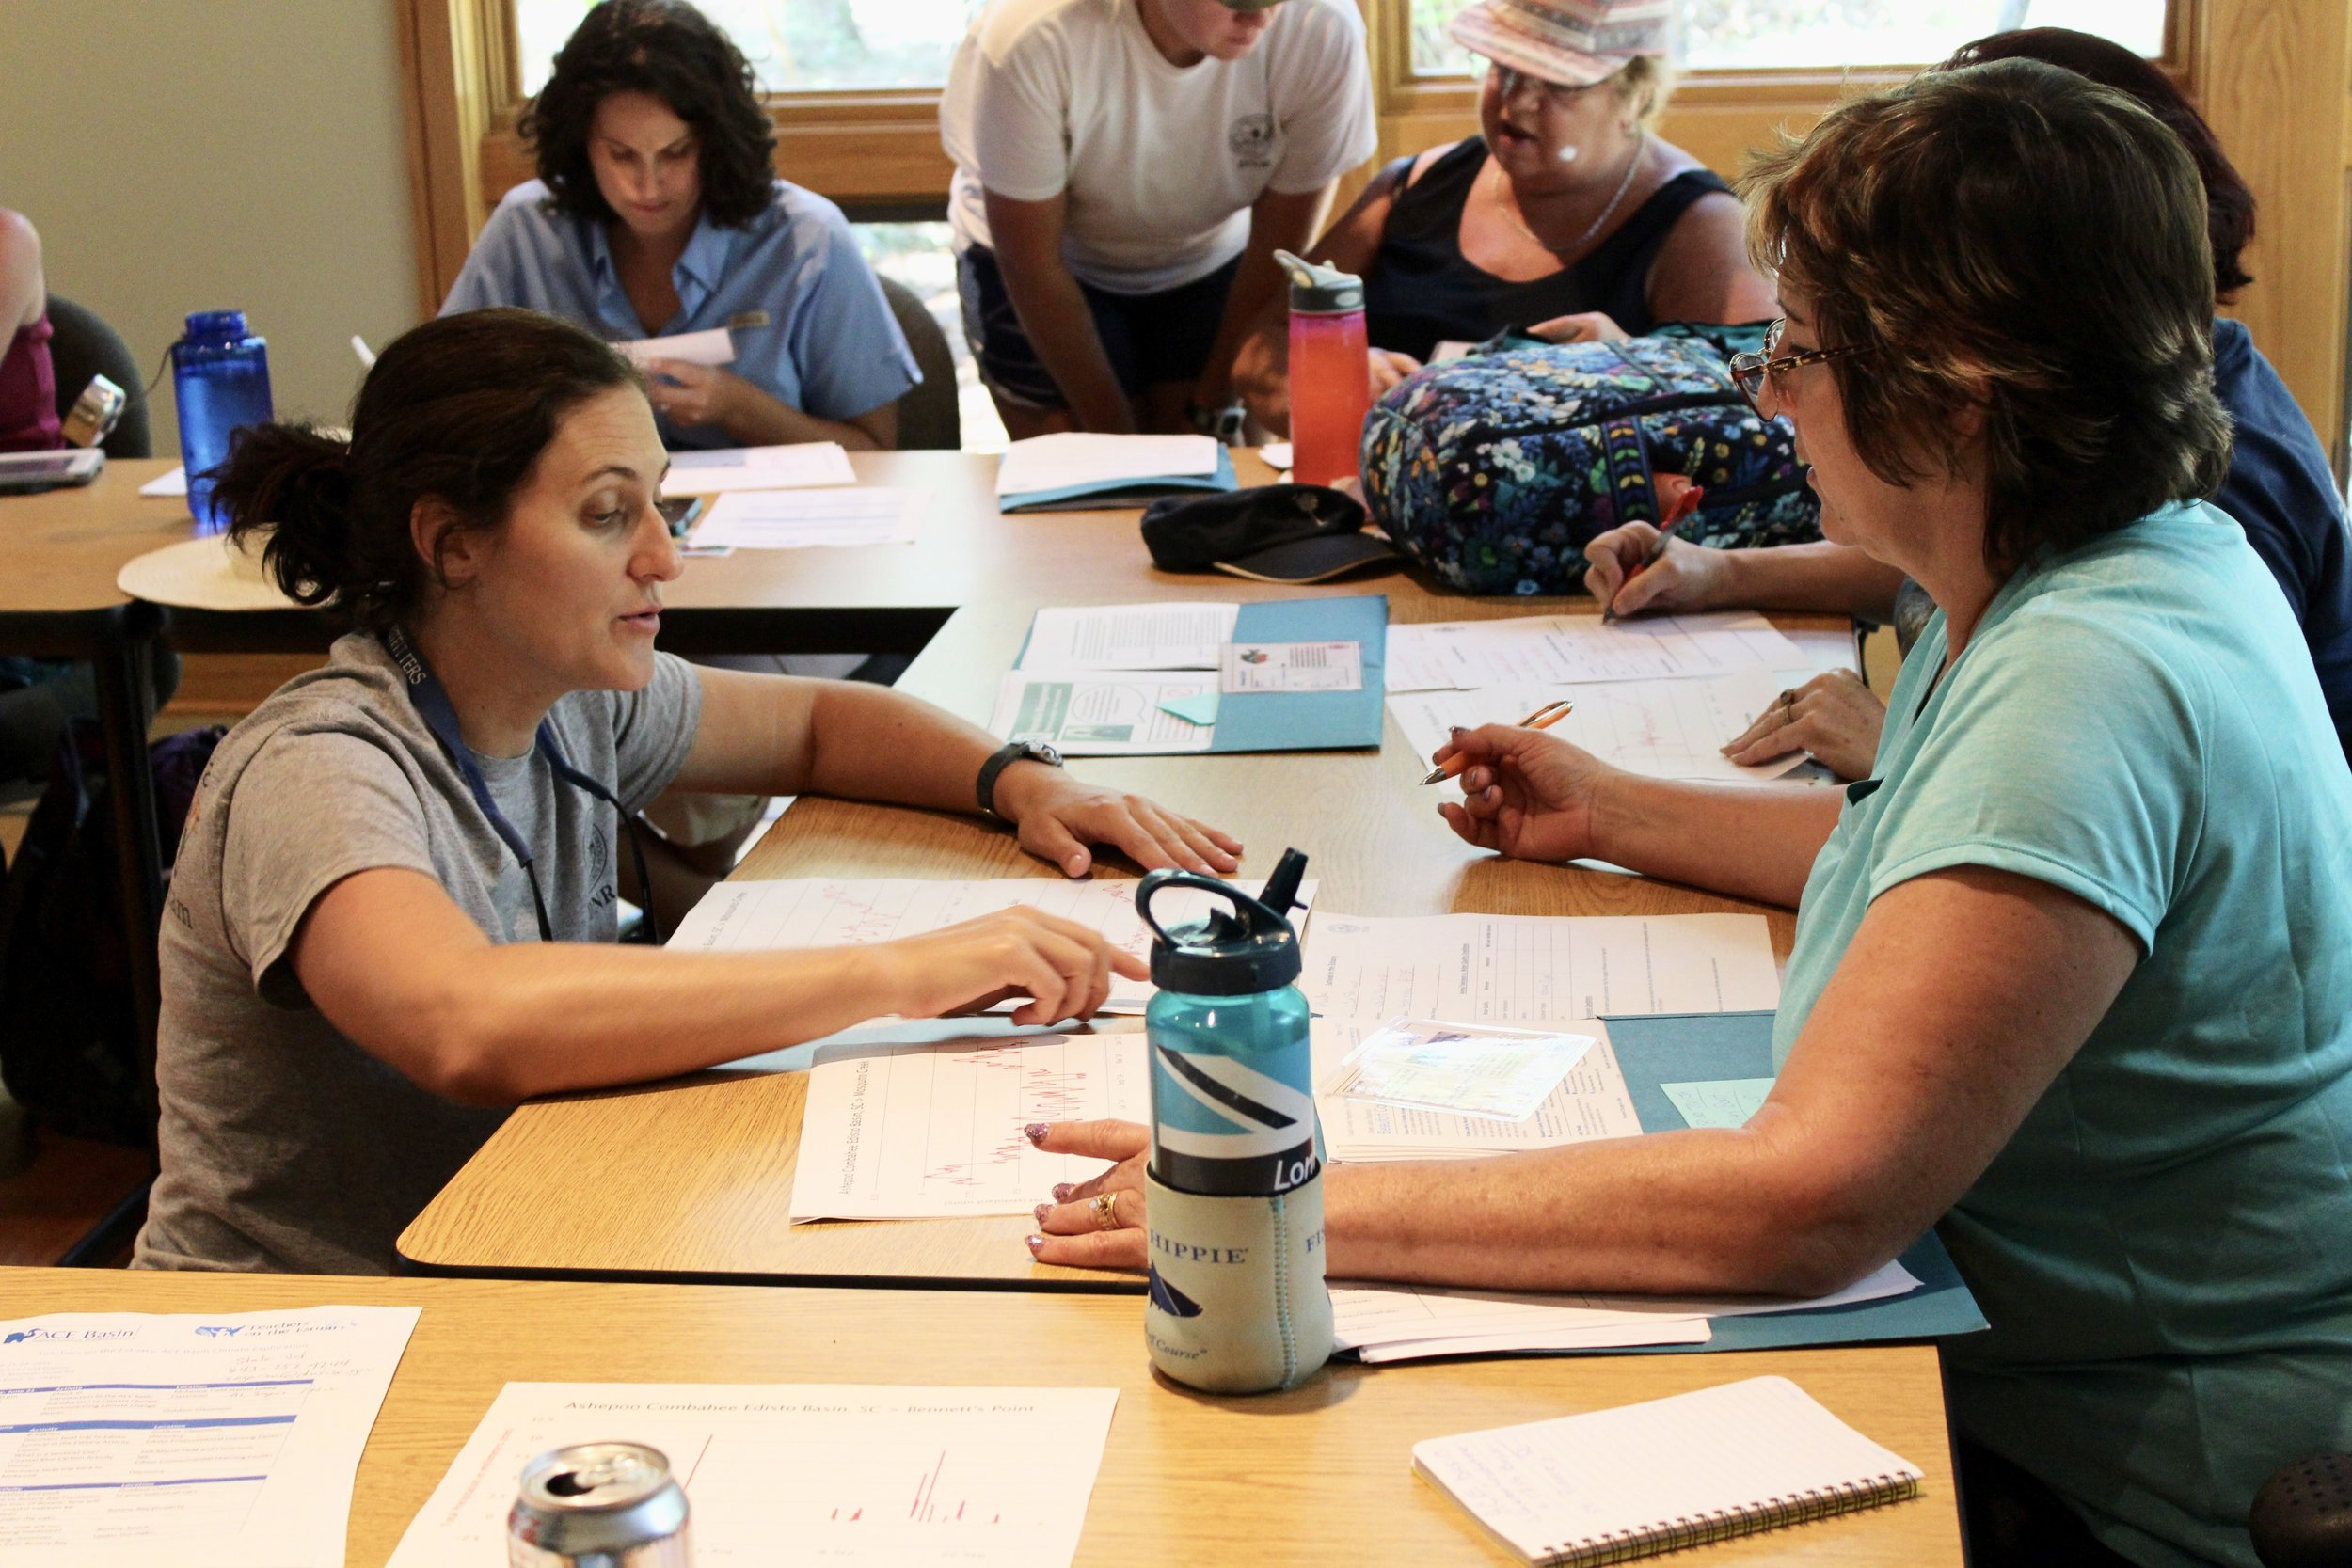 ACE Basin NERR education coordinator Julie Binz discusses a workshop activity with participating teachers. (Photo: E. Weeks/SCDNR)